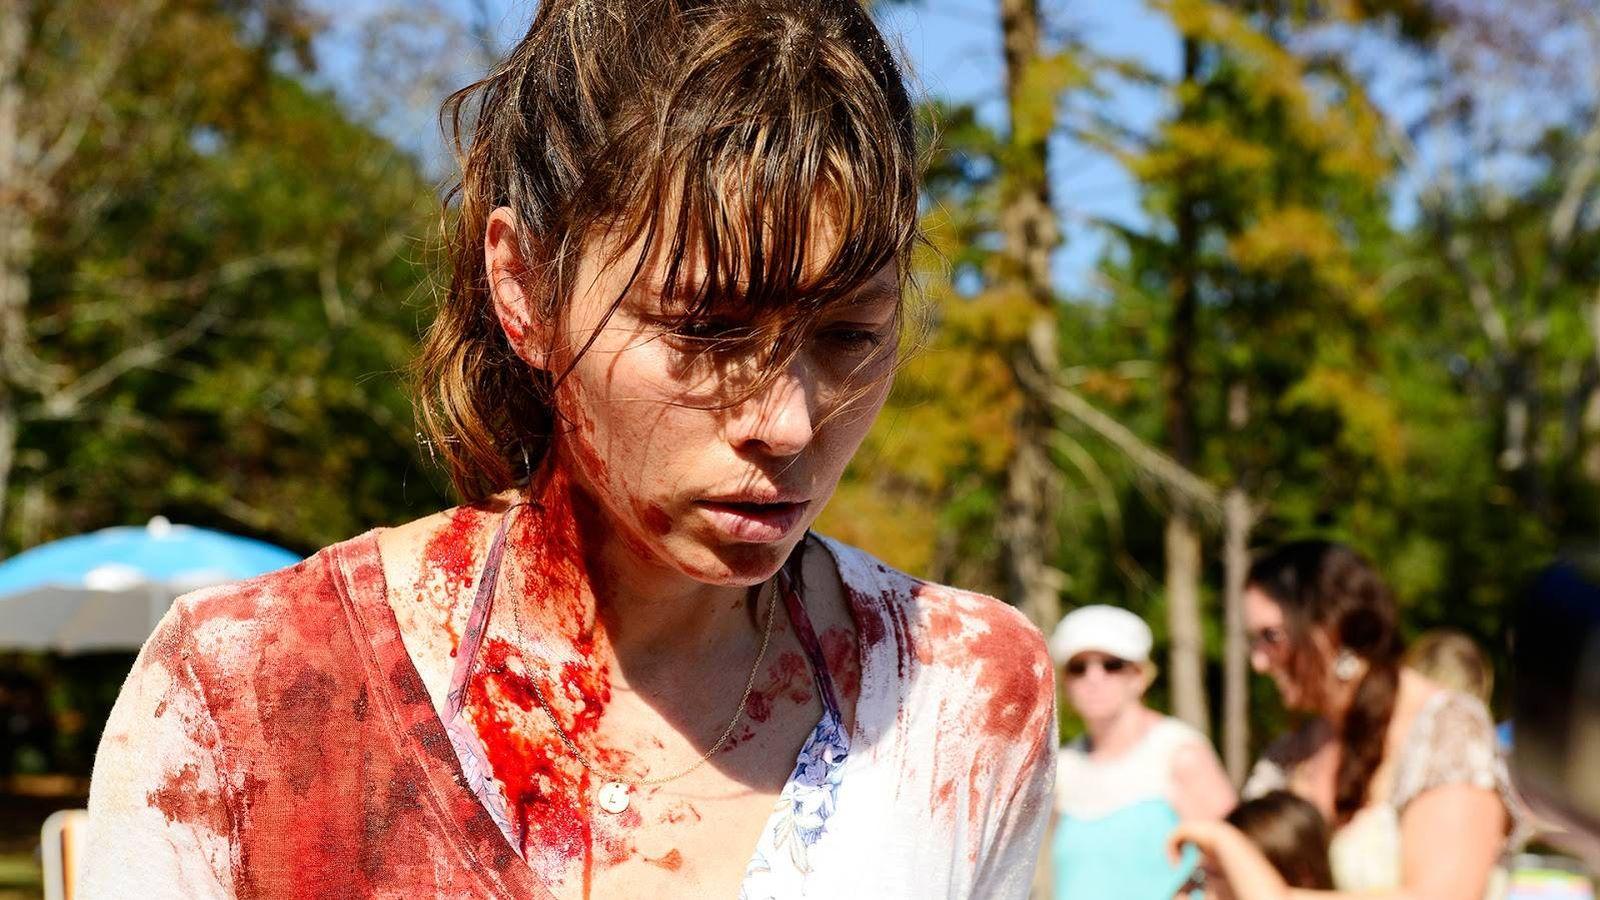 Foto: Jessica Biel, en el papel de Cora Tanetti, tras cometer un homicidio.